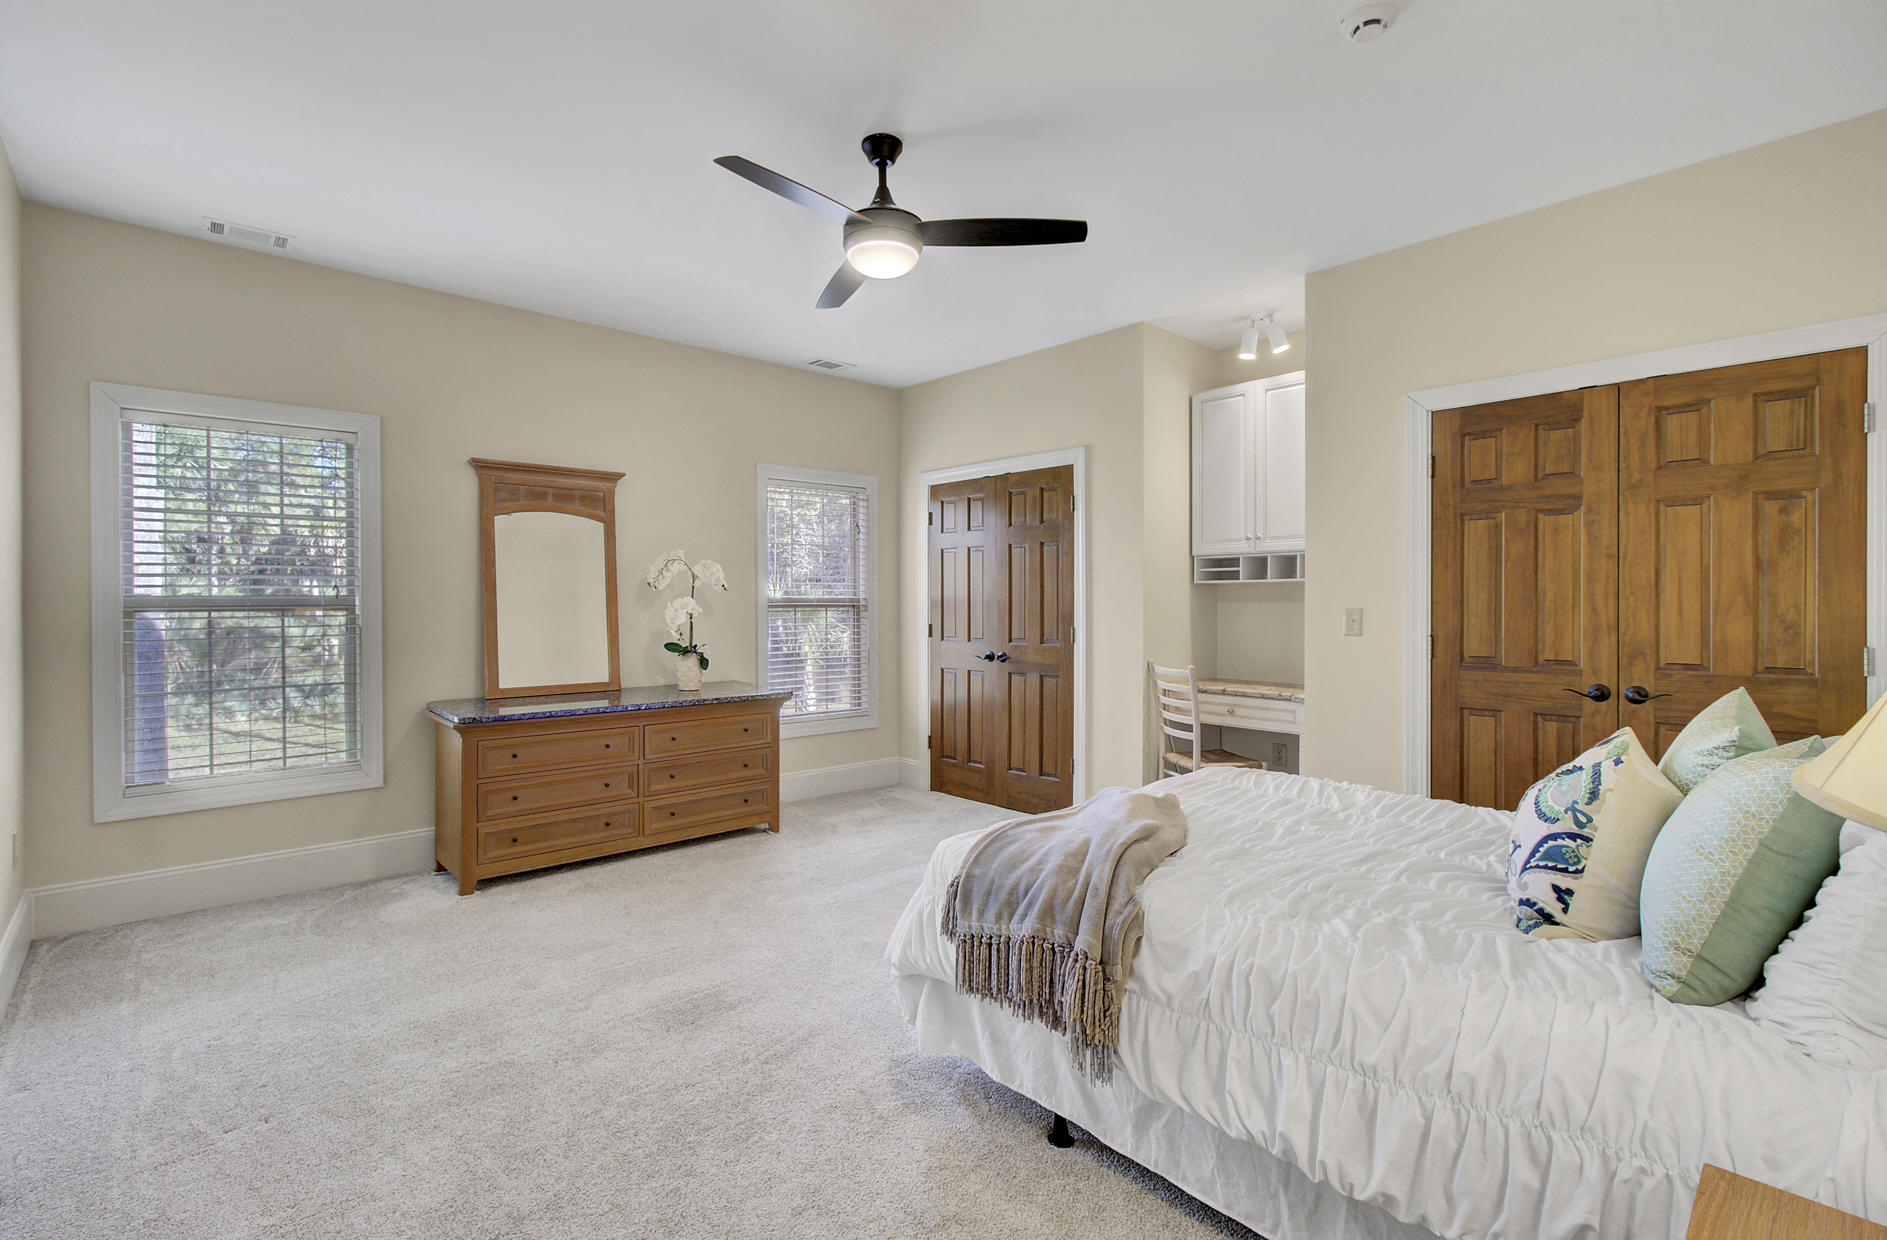 Dunes West Homes For Sale - 4123 Colonel Vanderhorst, Mount Pleasant, SC - 6